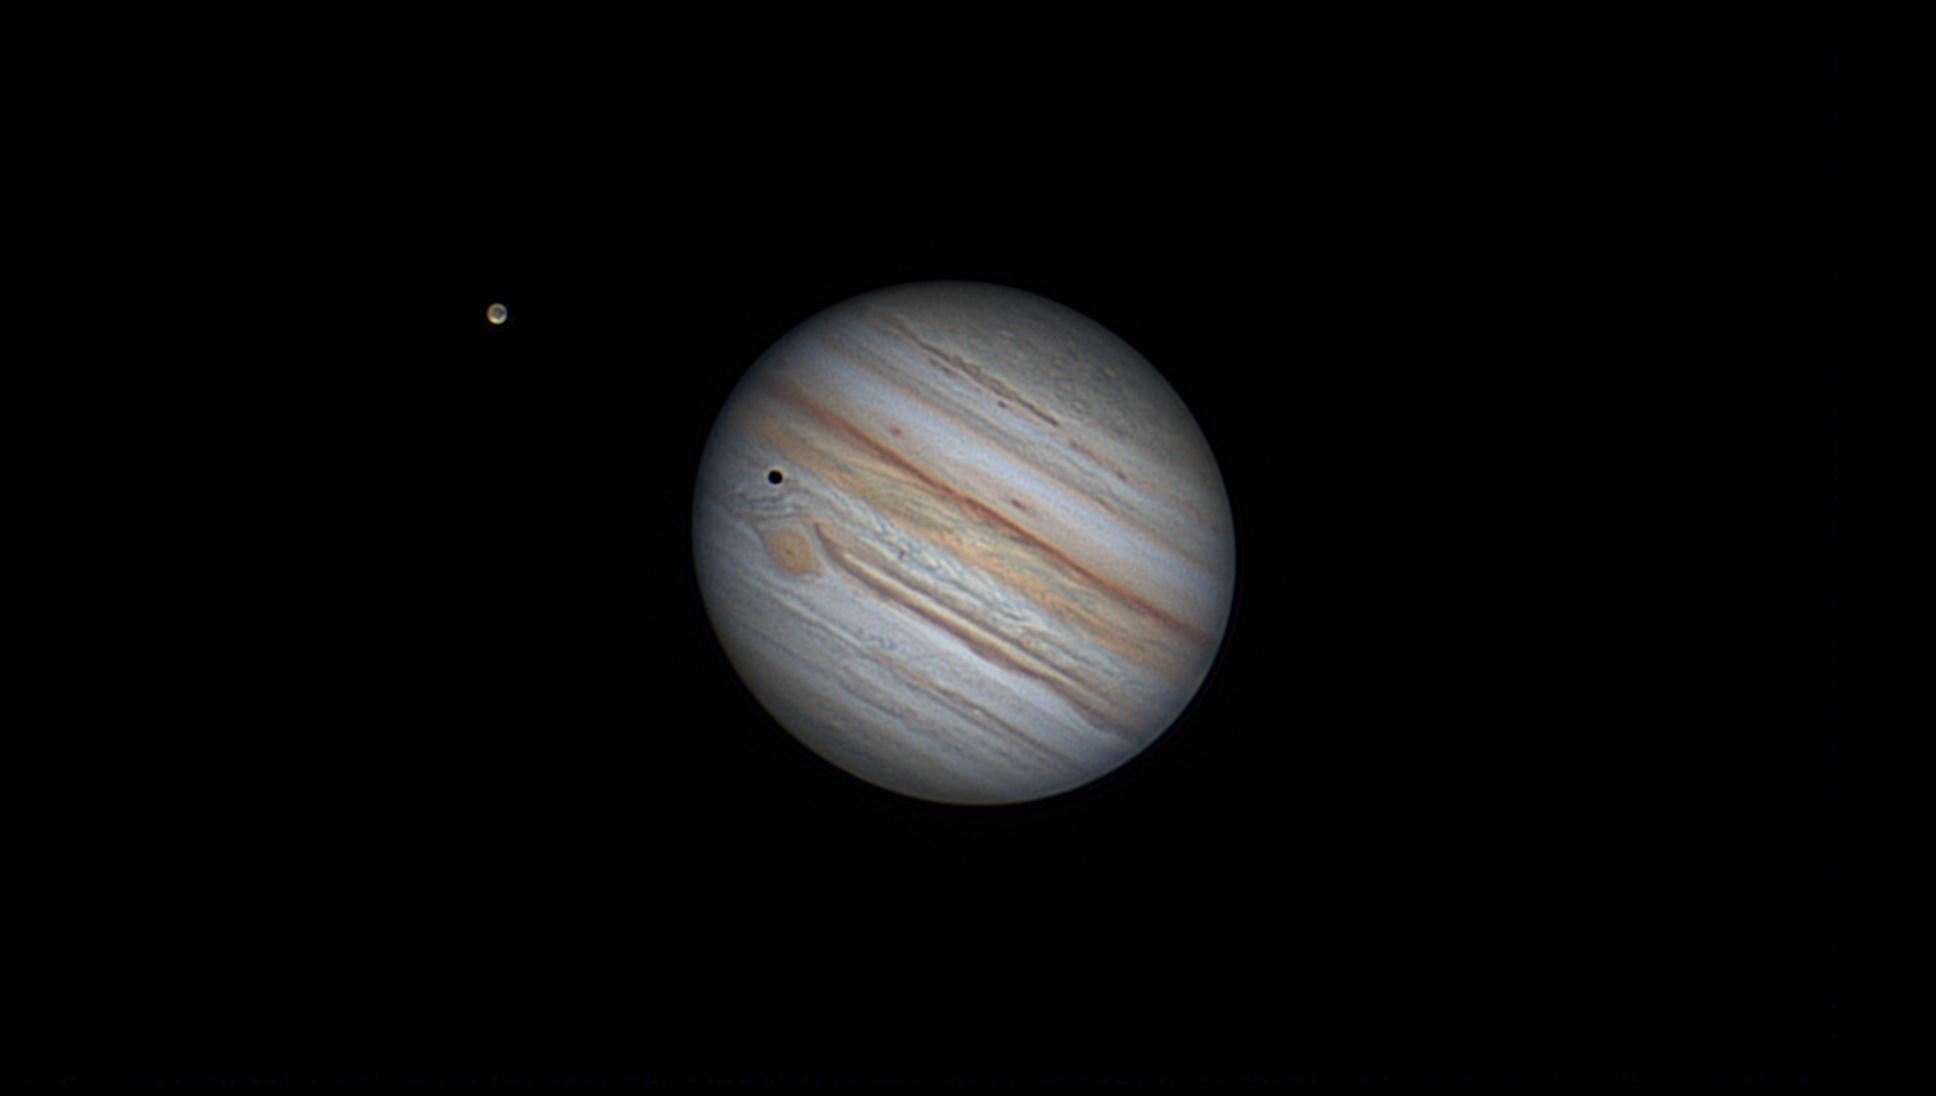 2021-09-05-2321_8-Jupiter_lapl5_ap497_conv do.jpg